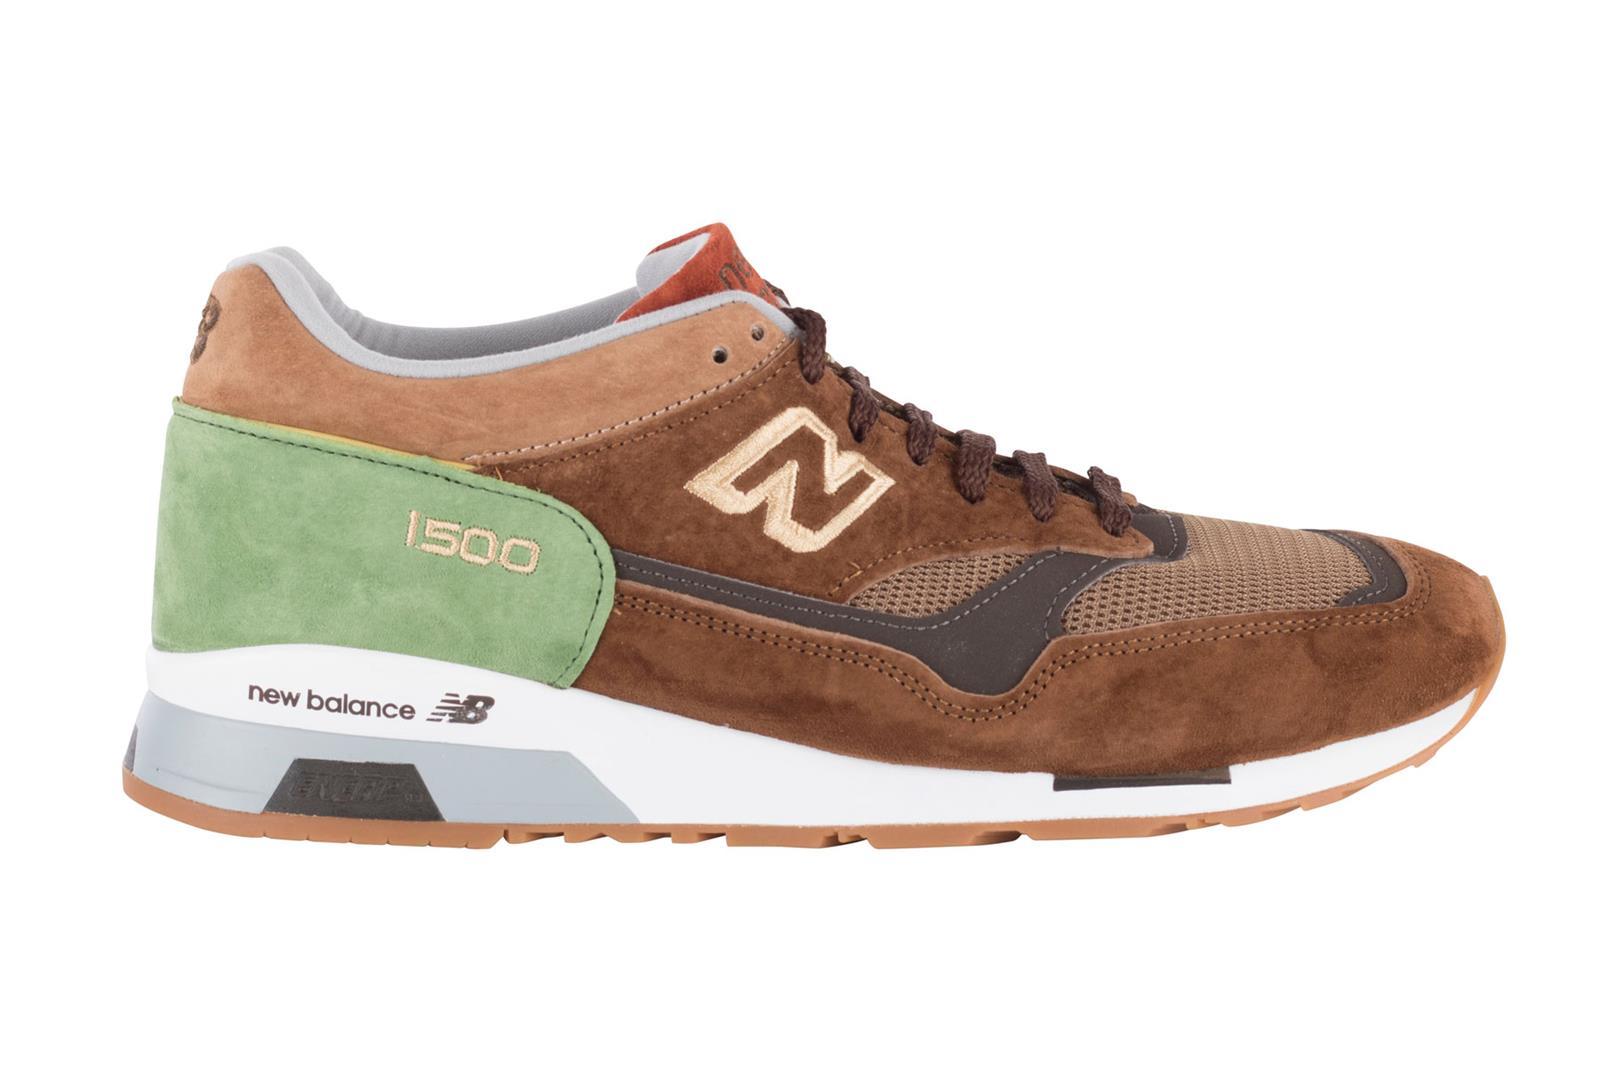 scarpe new balance uomo 1500